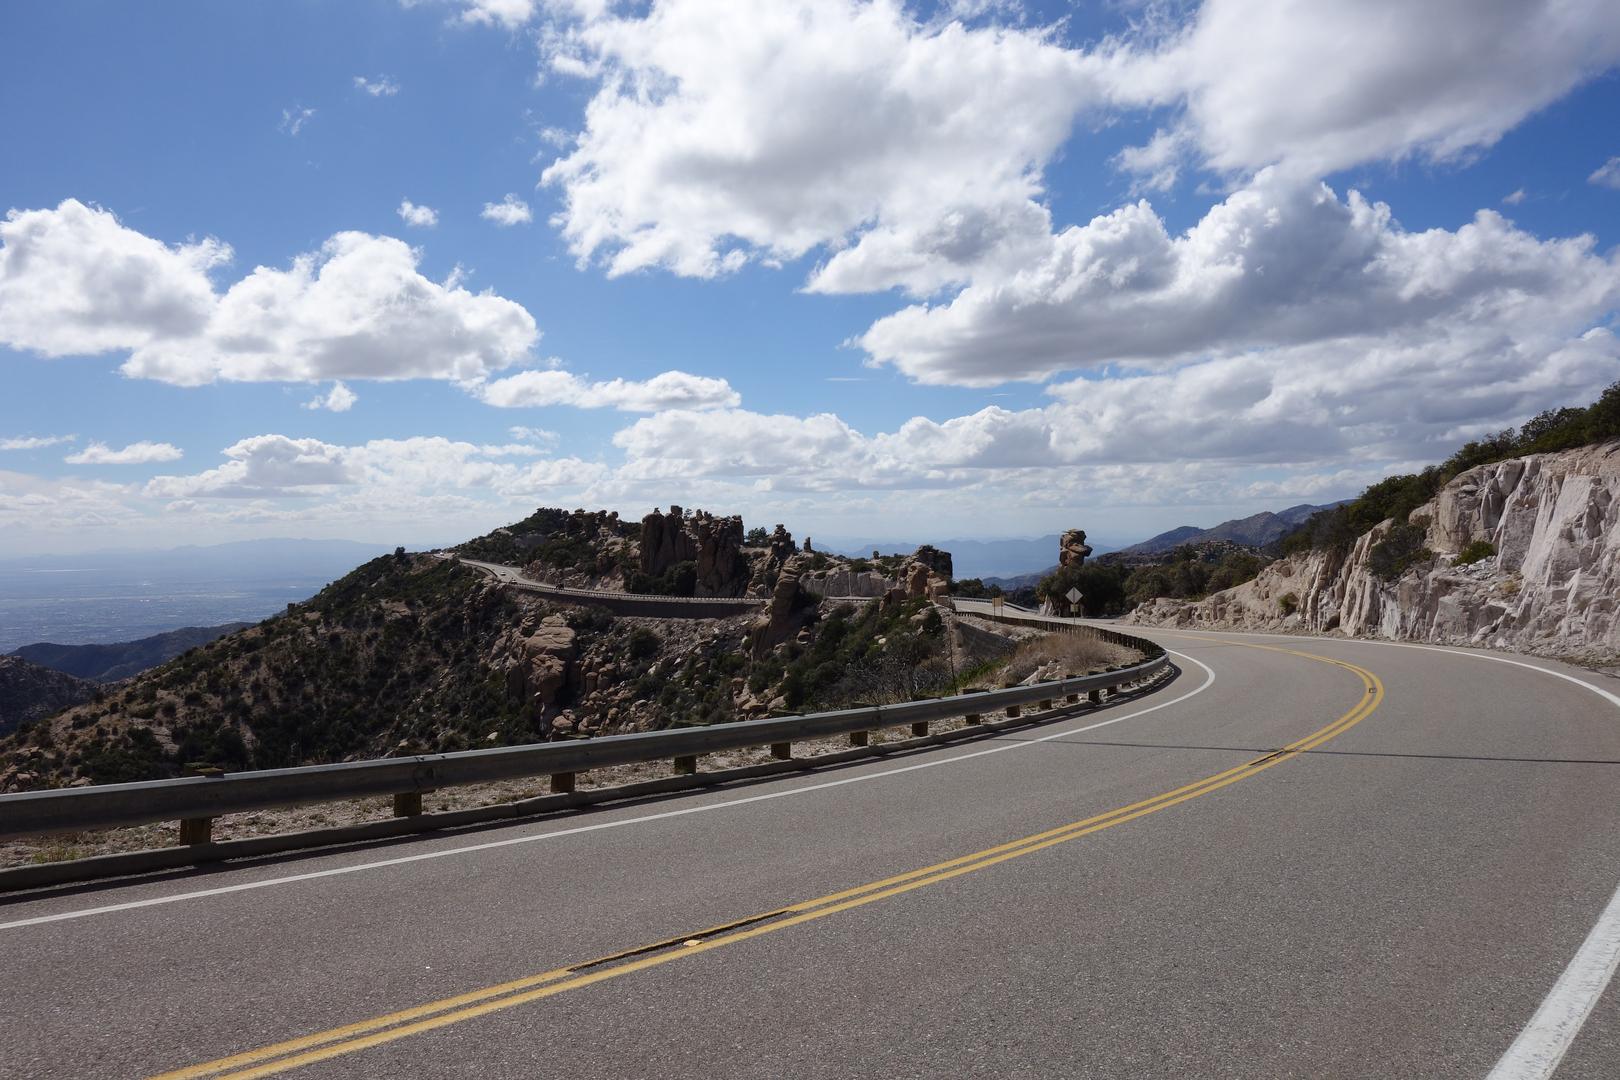 Mt Lemmon AZ Top US Bike Climb One Of Toughest Hardest - Old us 80 arizona map